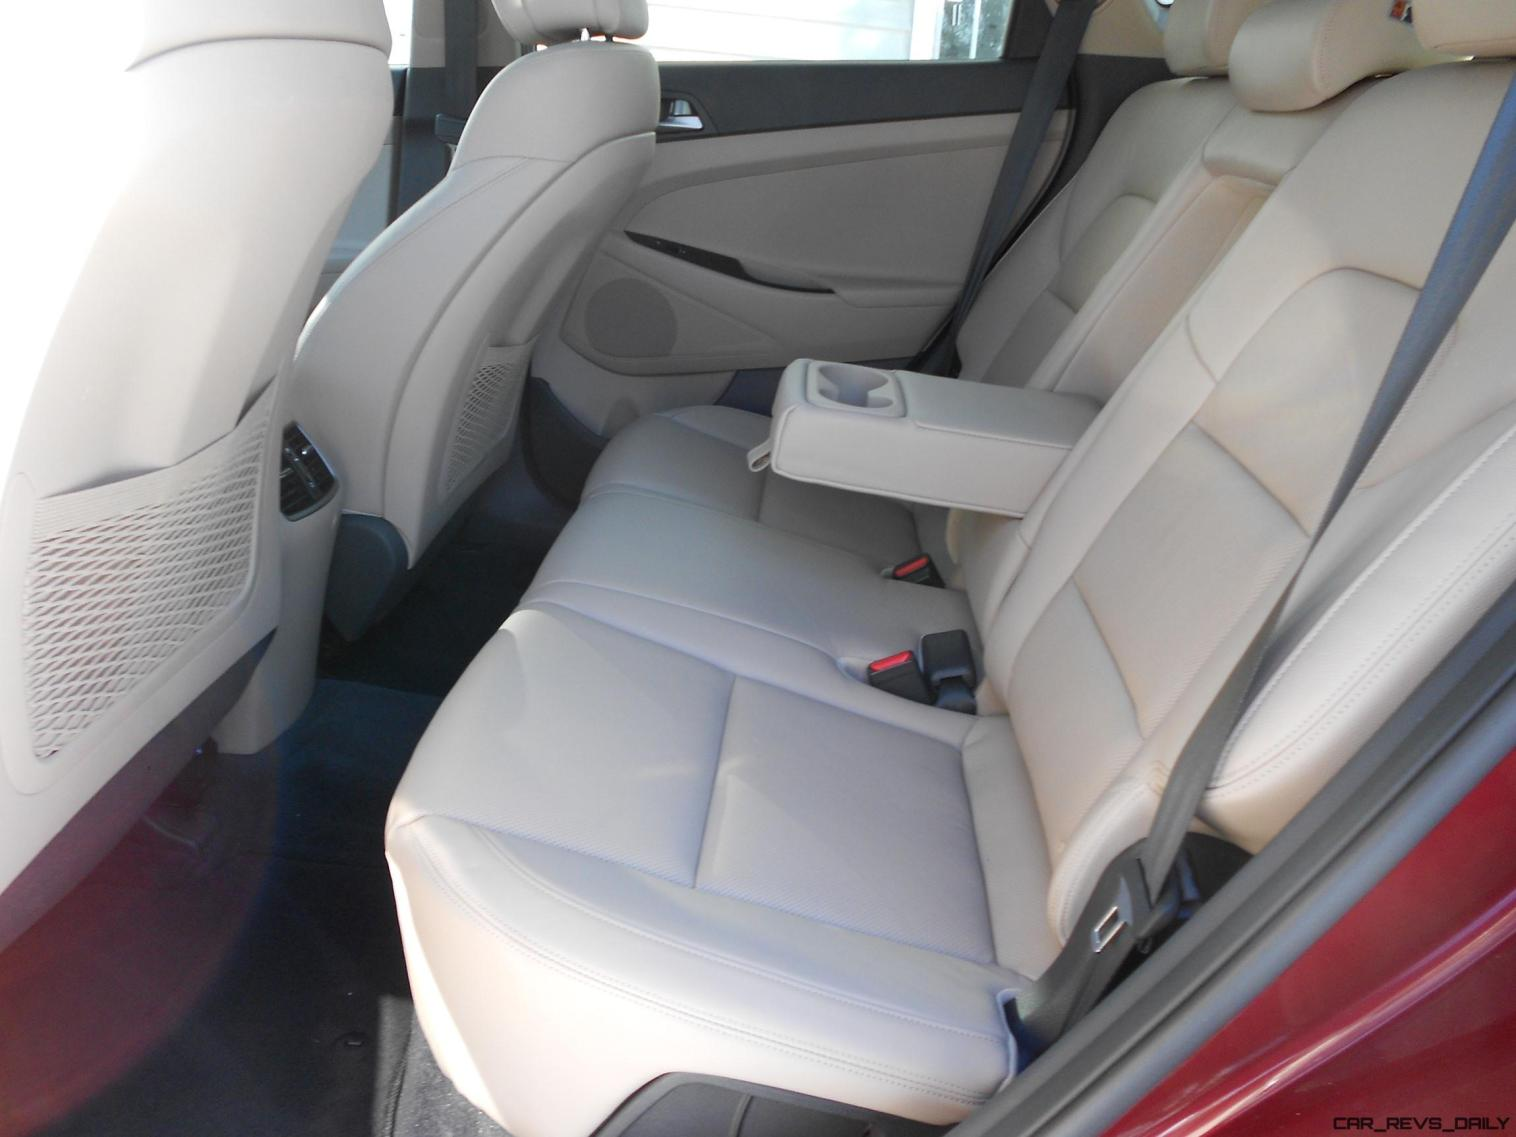 2016 Hyundai Tucson Review - Interior Photos 5